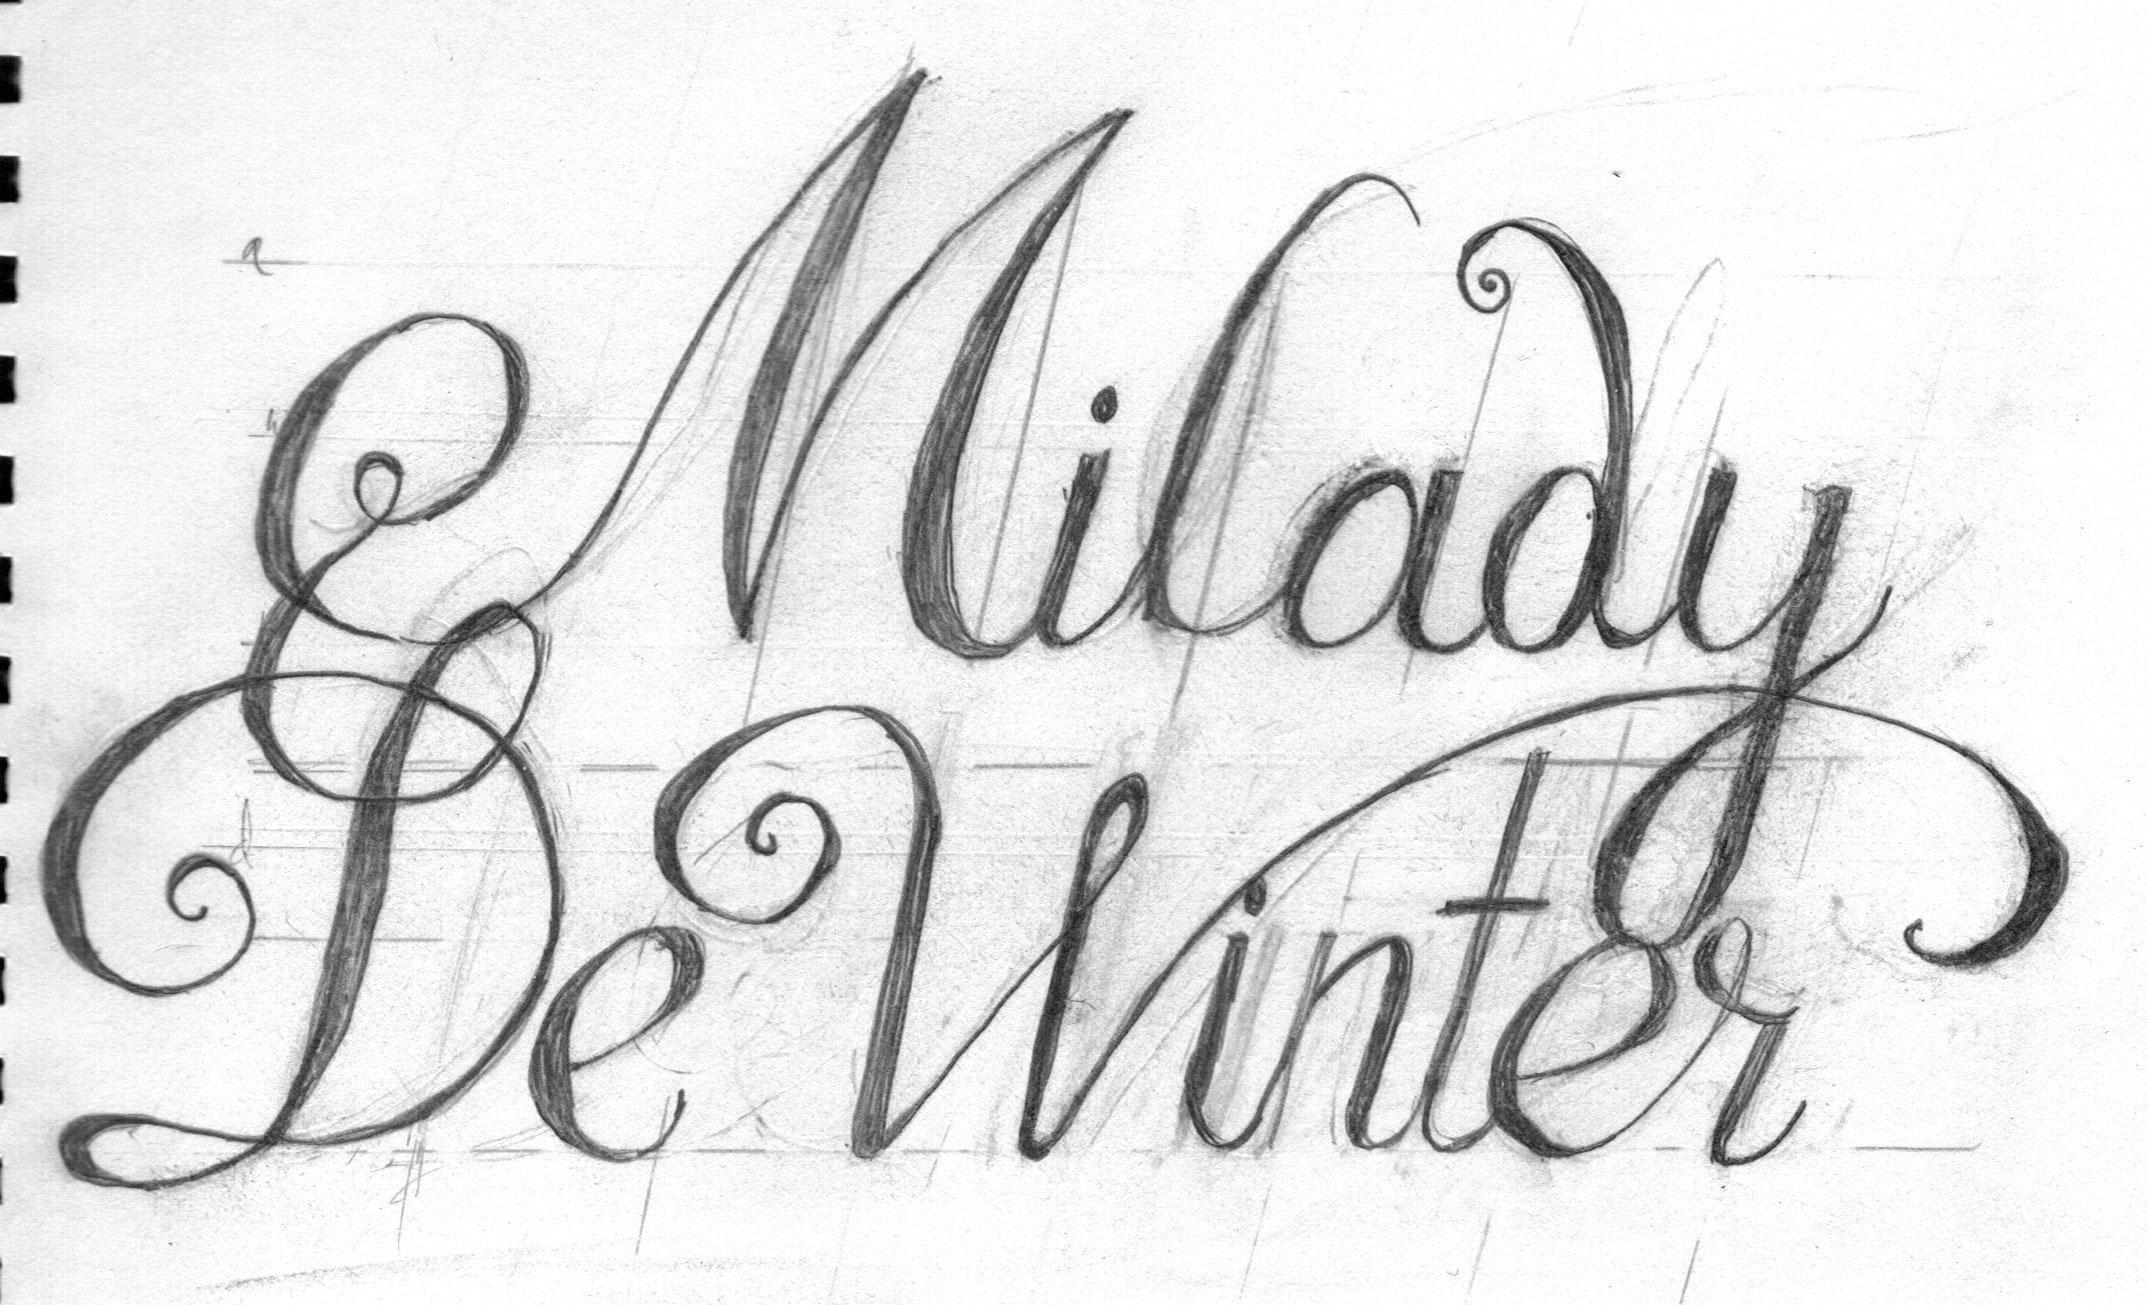 Milady De Winter - image 3 - student project